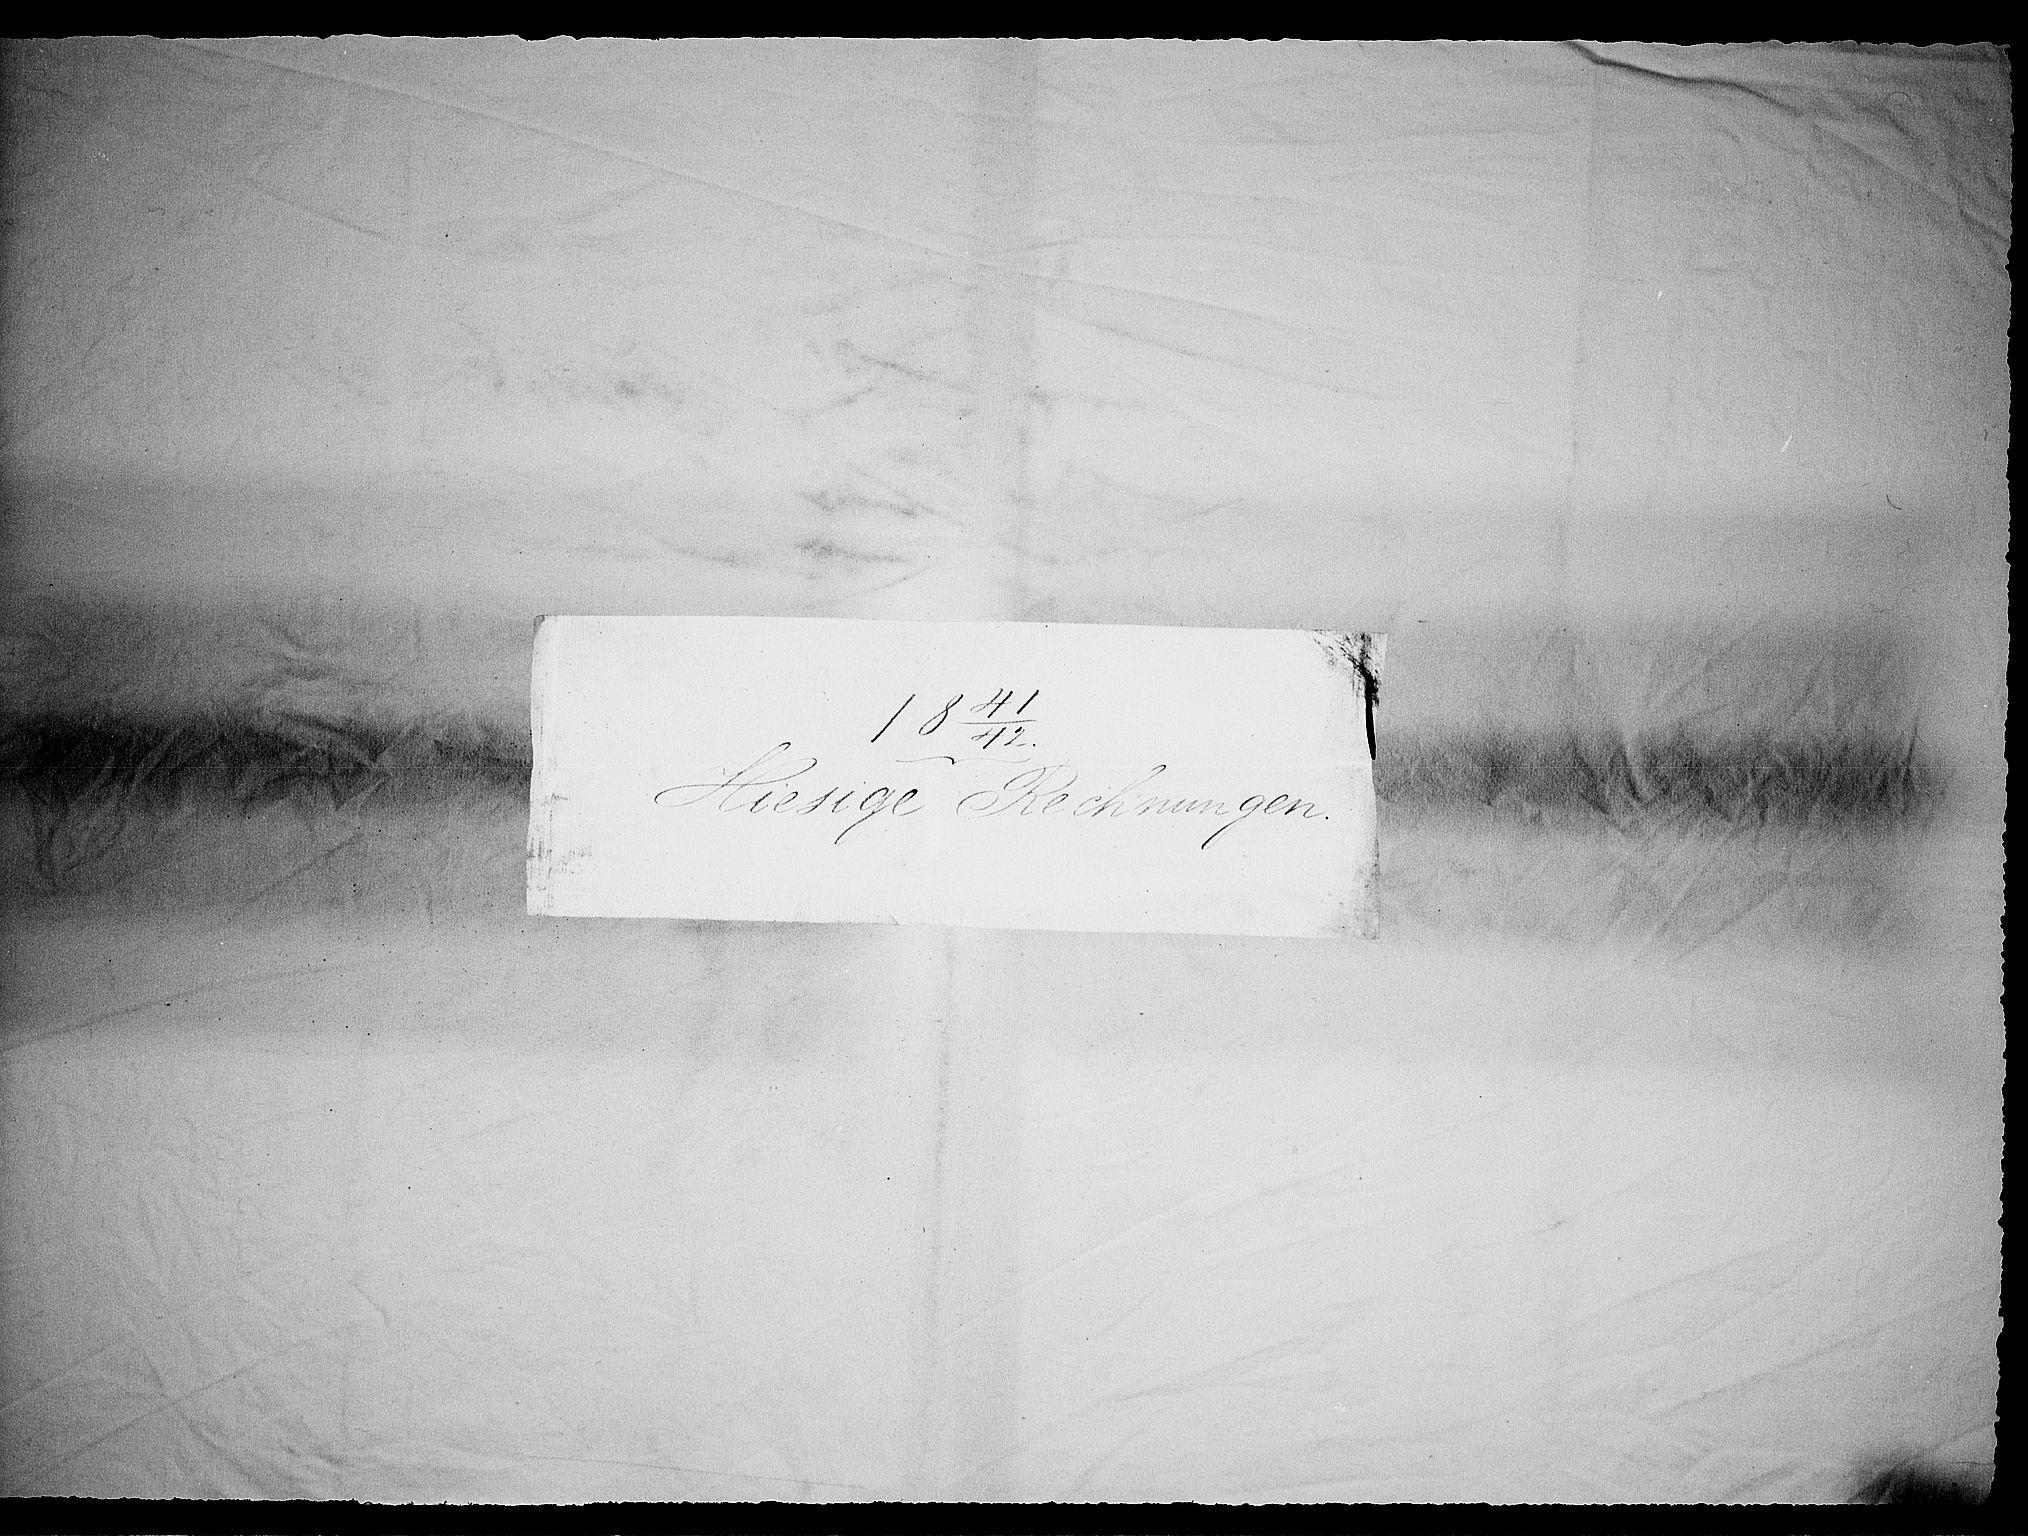 RA, Modums Blaafarveværk, G/Gd/Gdc/L0220, 1841-1846, s. 2